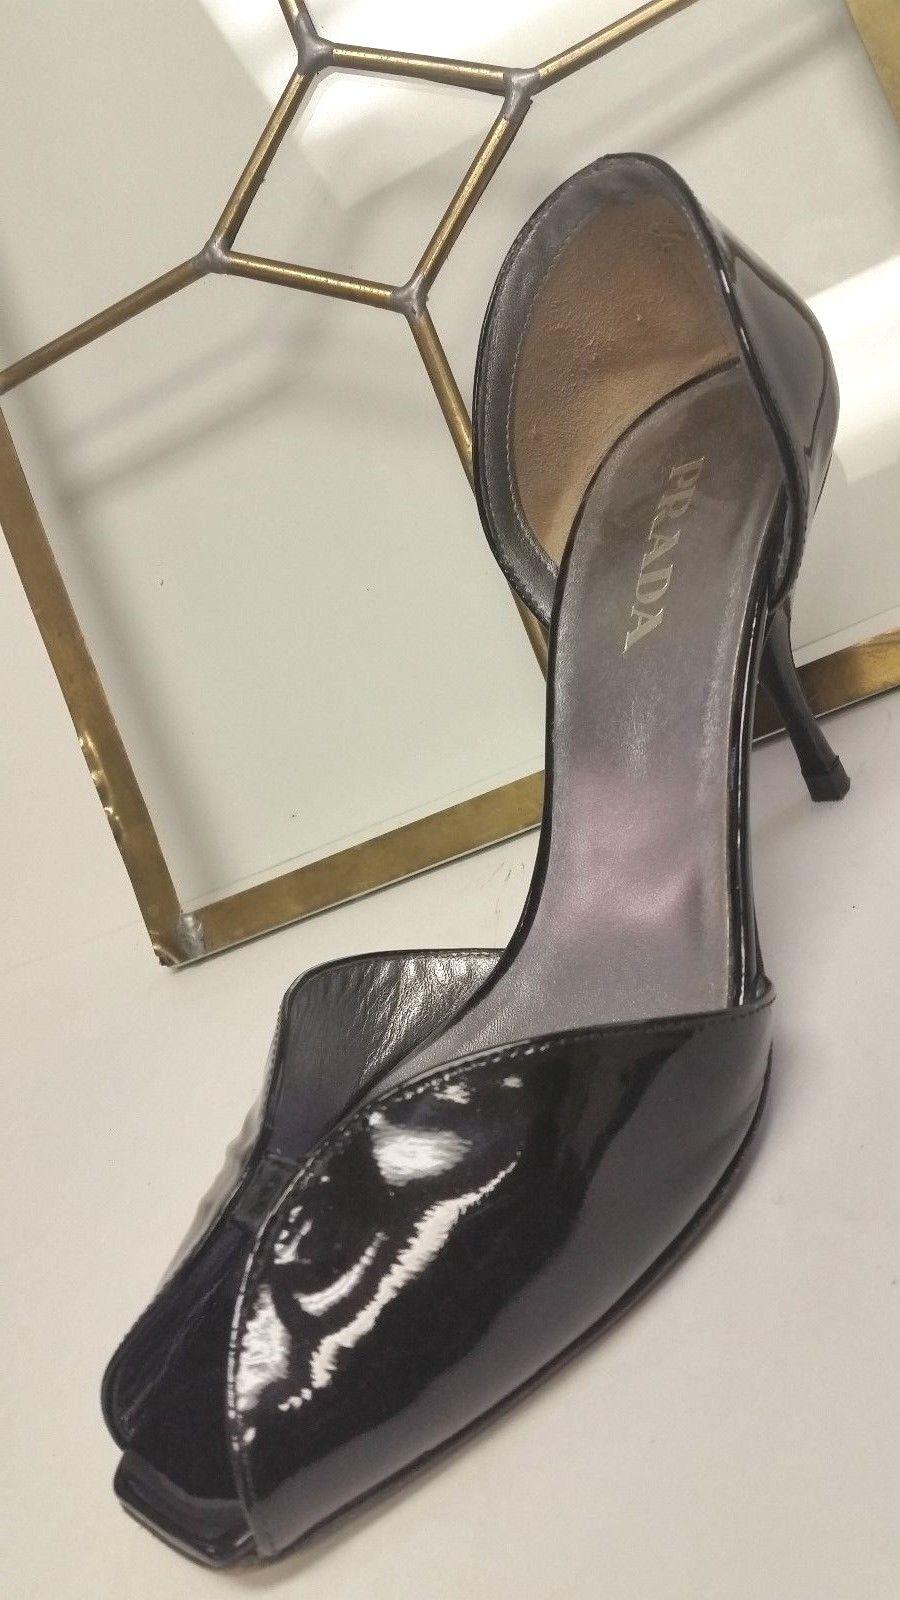 Prada Women's SZ 37 6.5 Black Black 6.5 Patent Leather Peep Toe Stilleto High Heel Pump 6f28f5